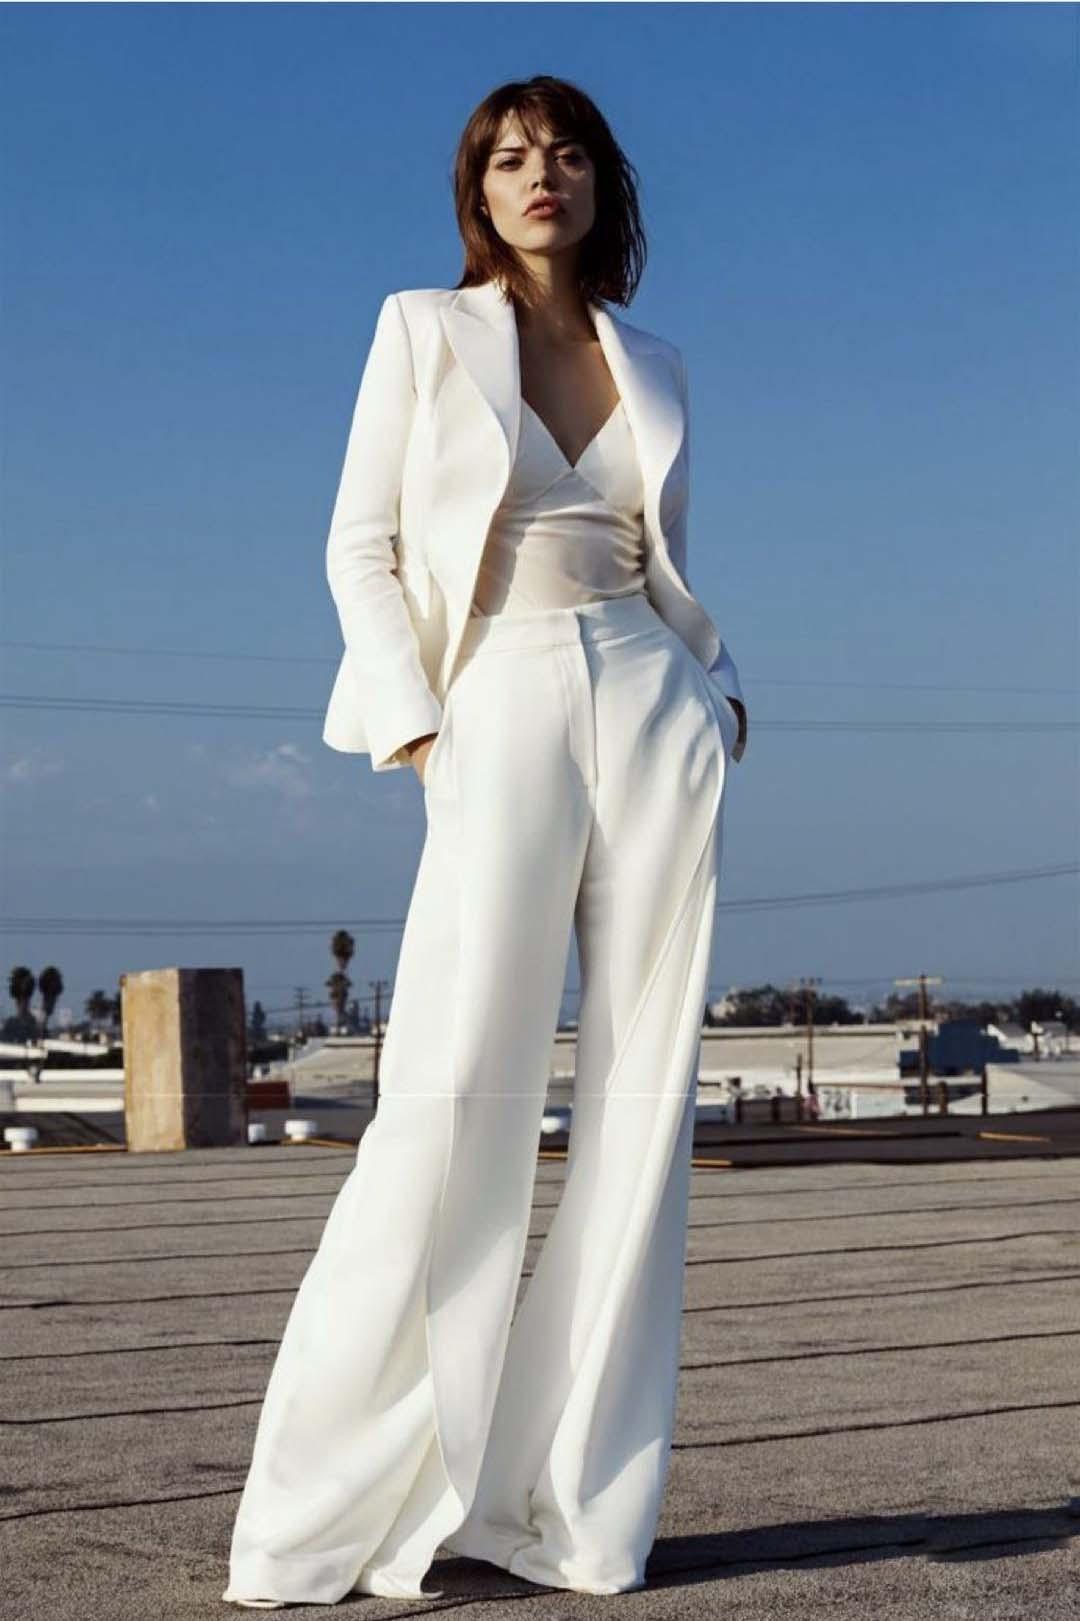 New Women Spring Suits Business Women Suit Business Suits Formal Female Work Wear Summer 2 pcs Female Suits